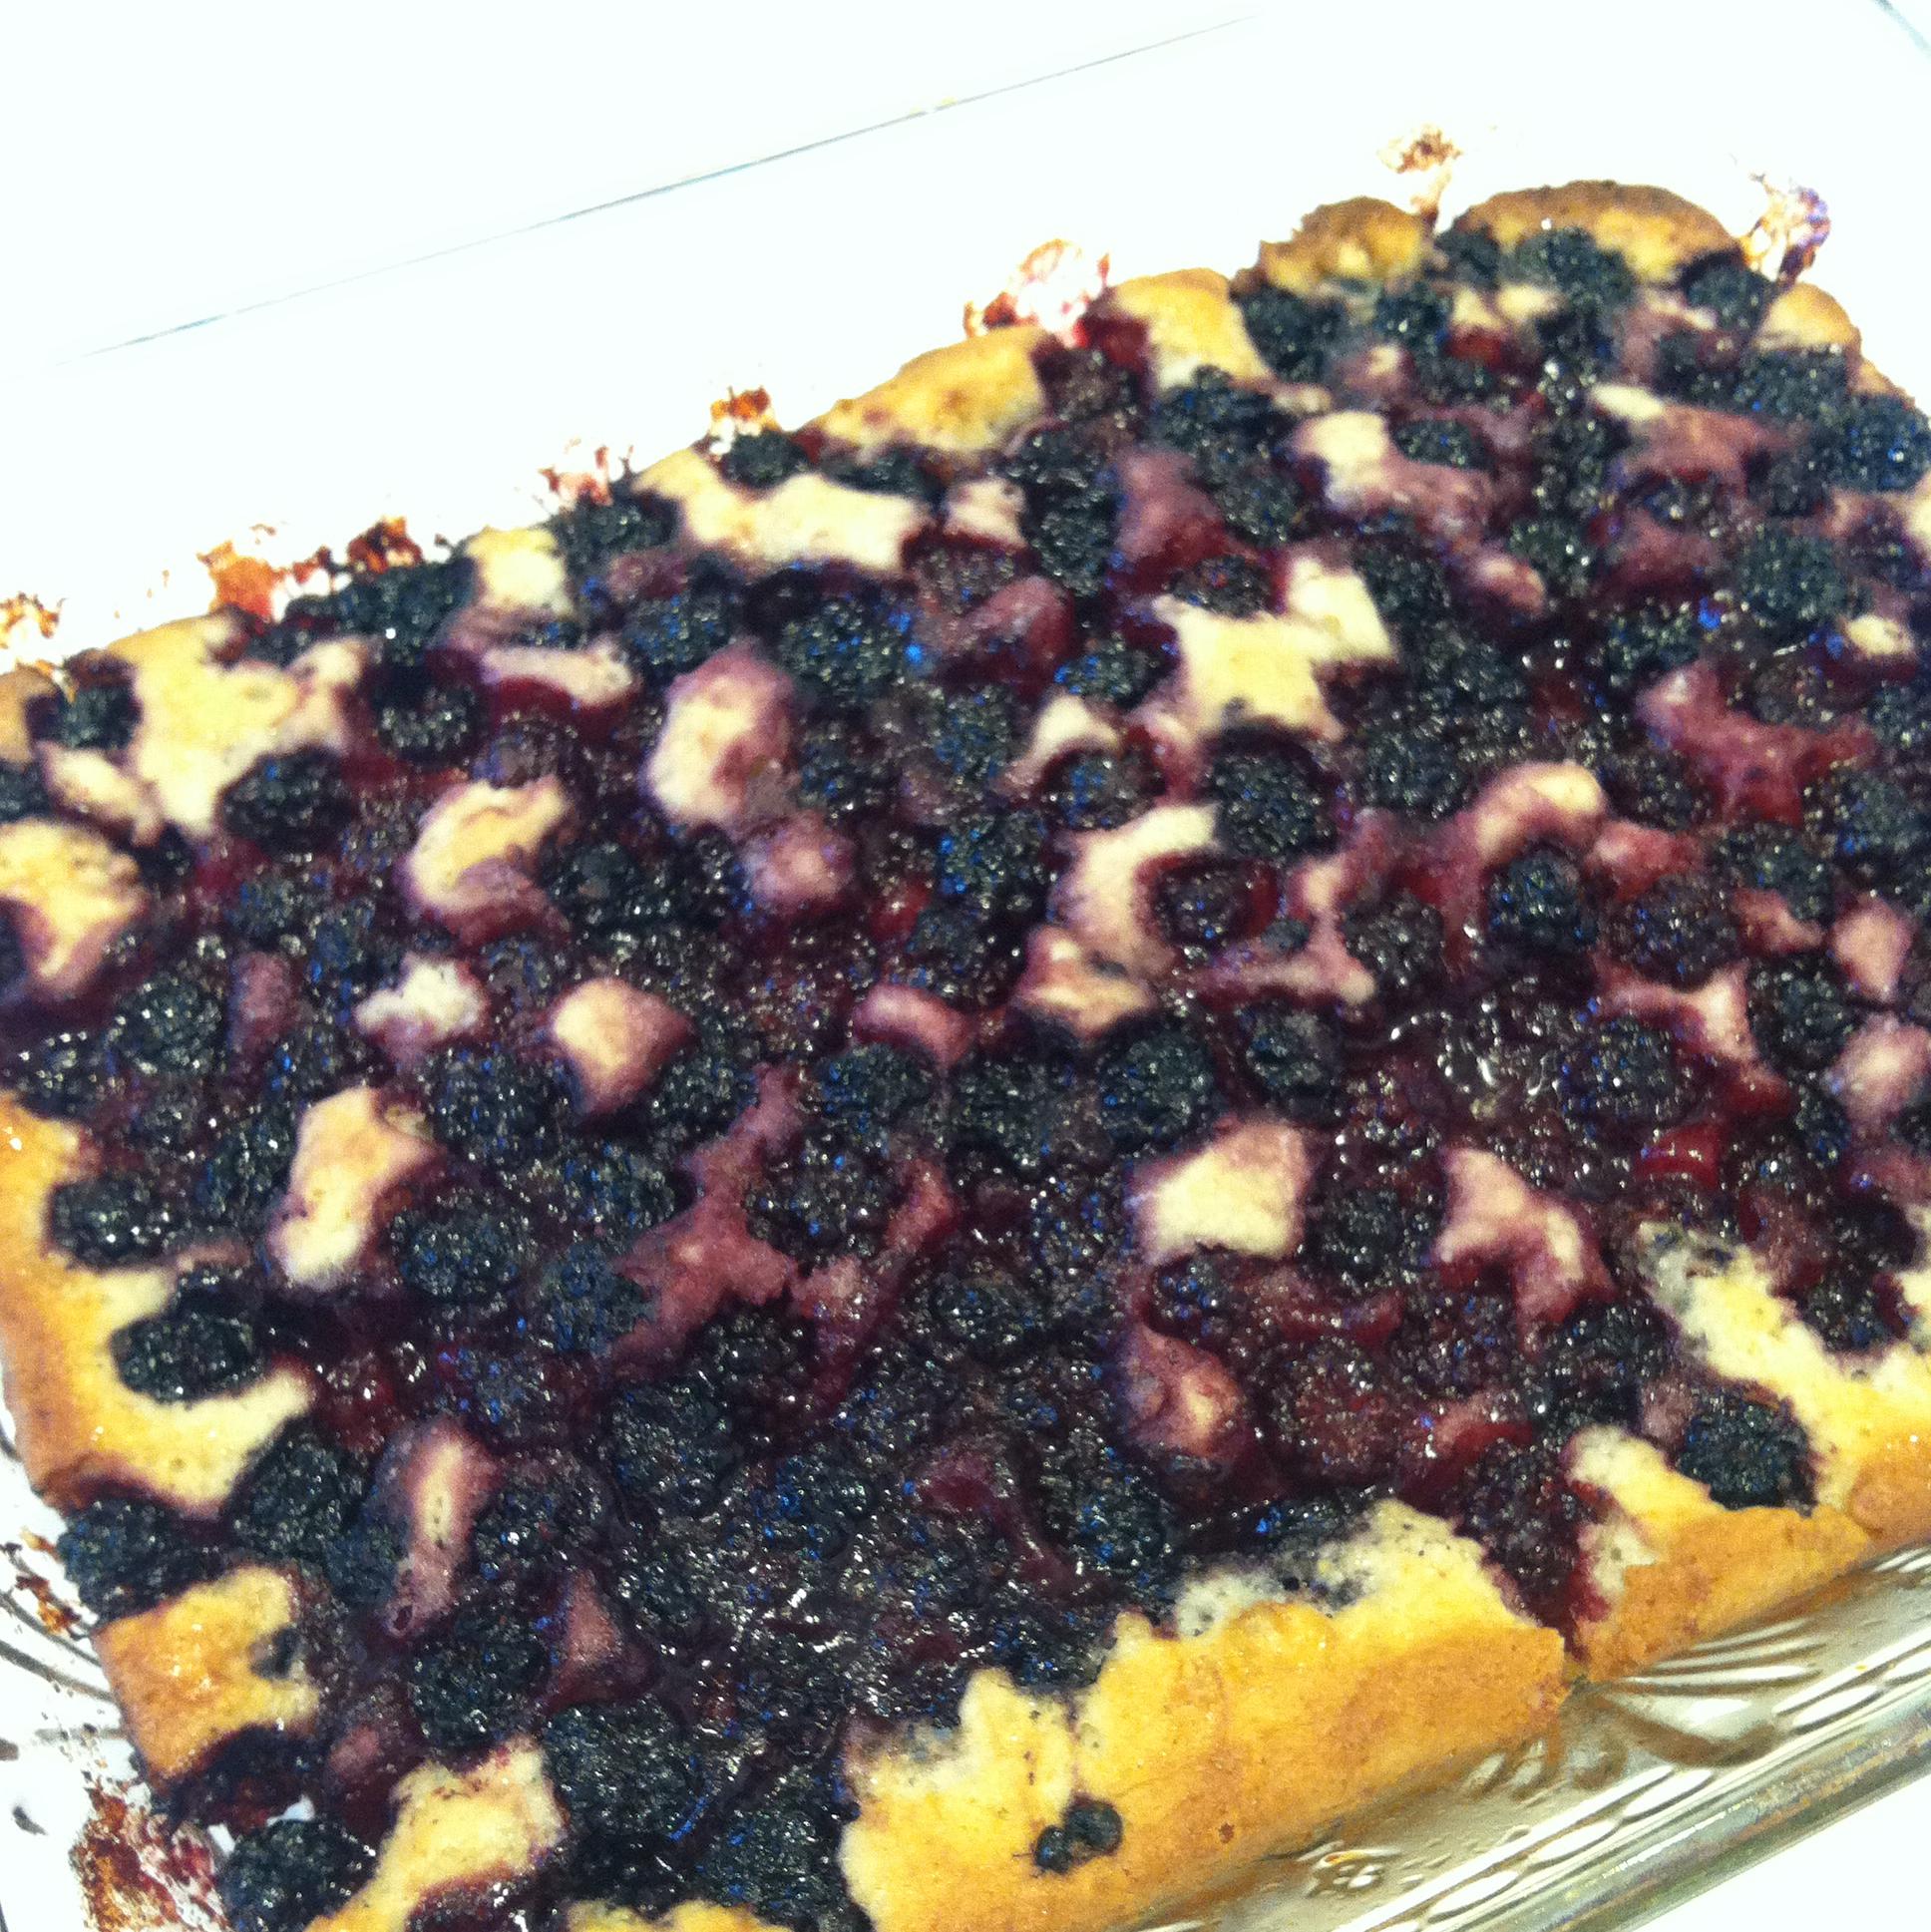 Chef John's Blackberry Buckle